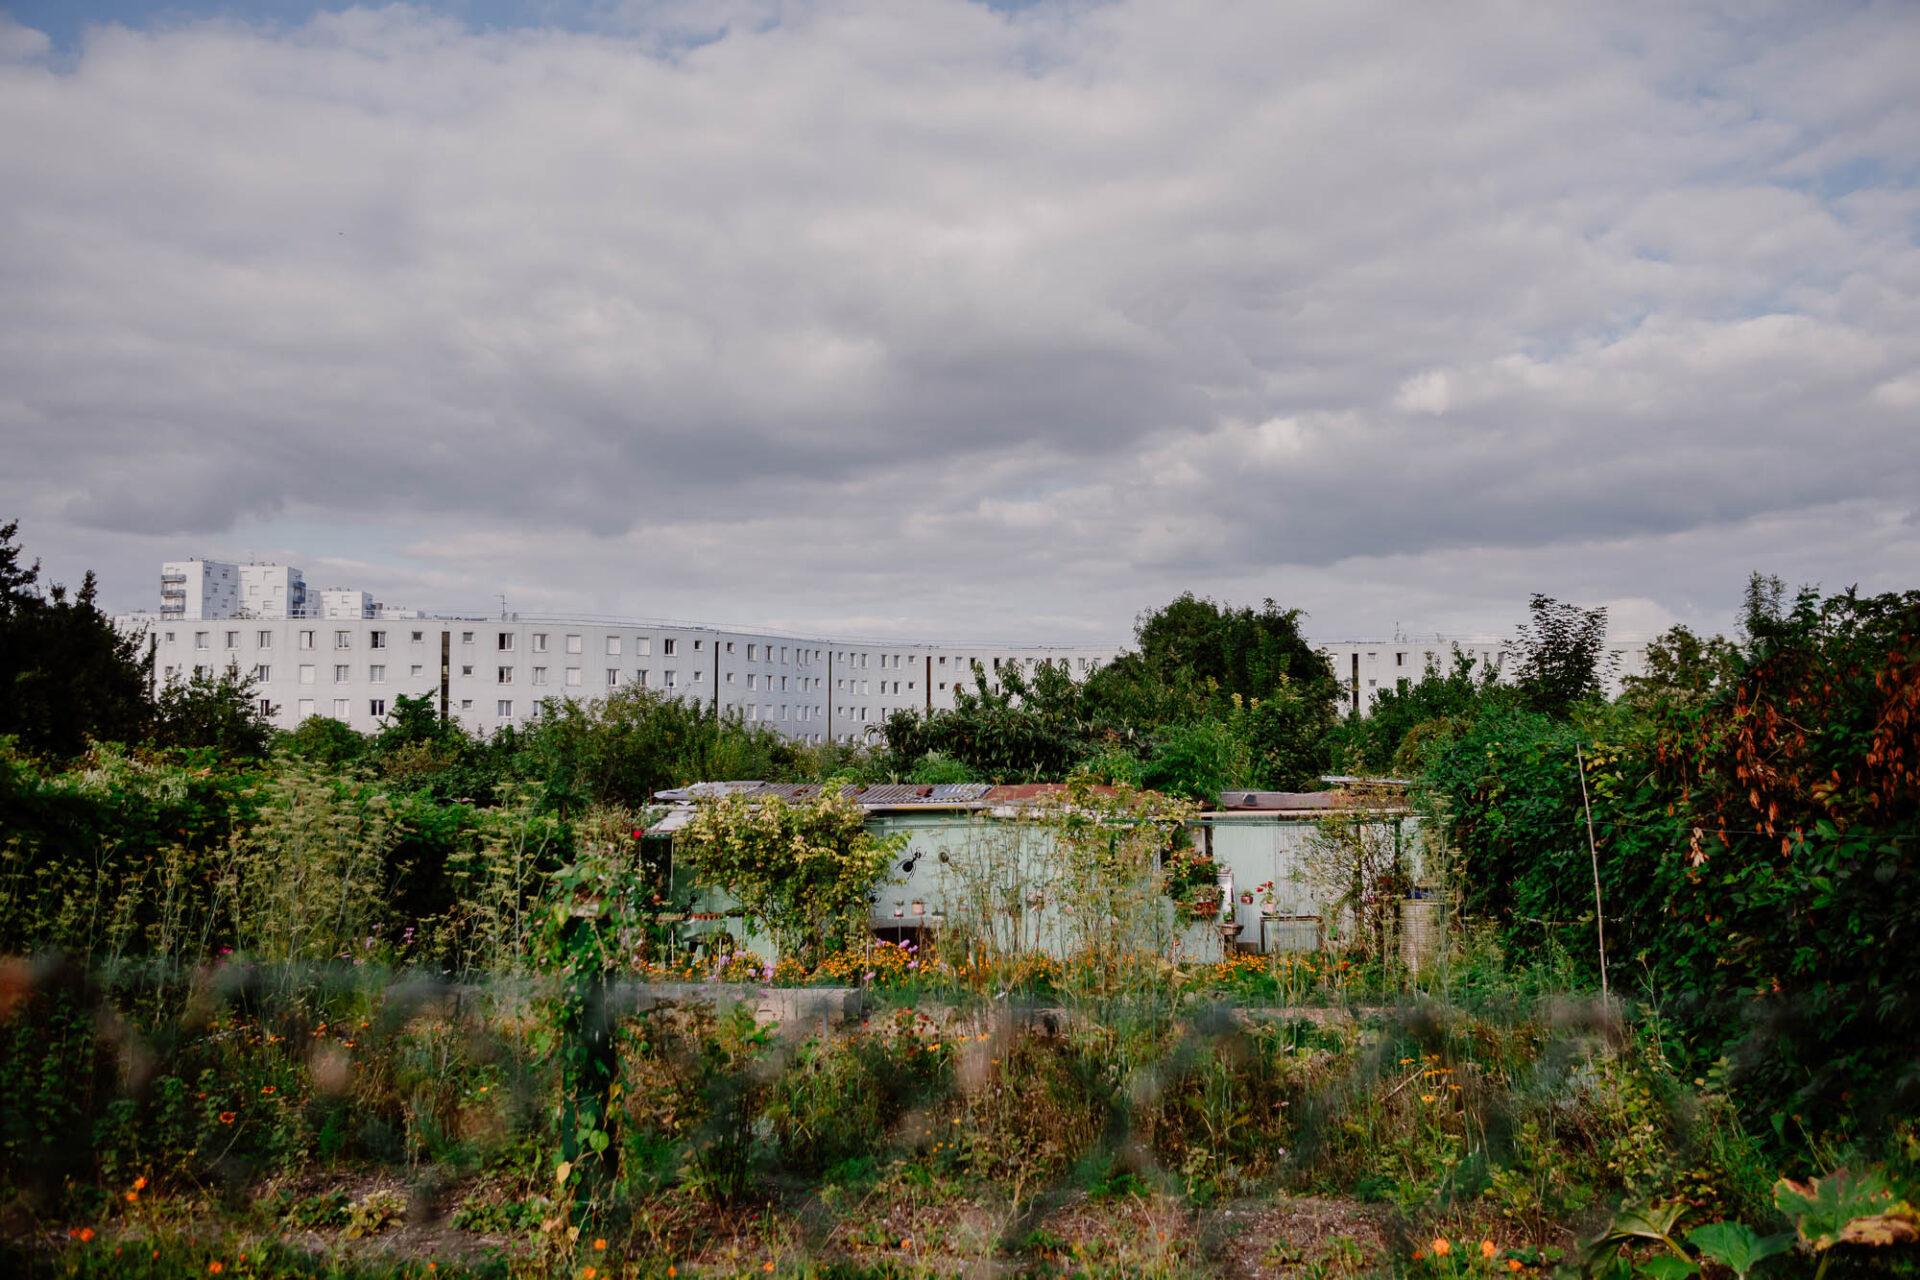 Jardins ouvriers aubervilliers 5 - Dagmara Bojenko - Eco-conscious Weddings, Births & Families